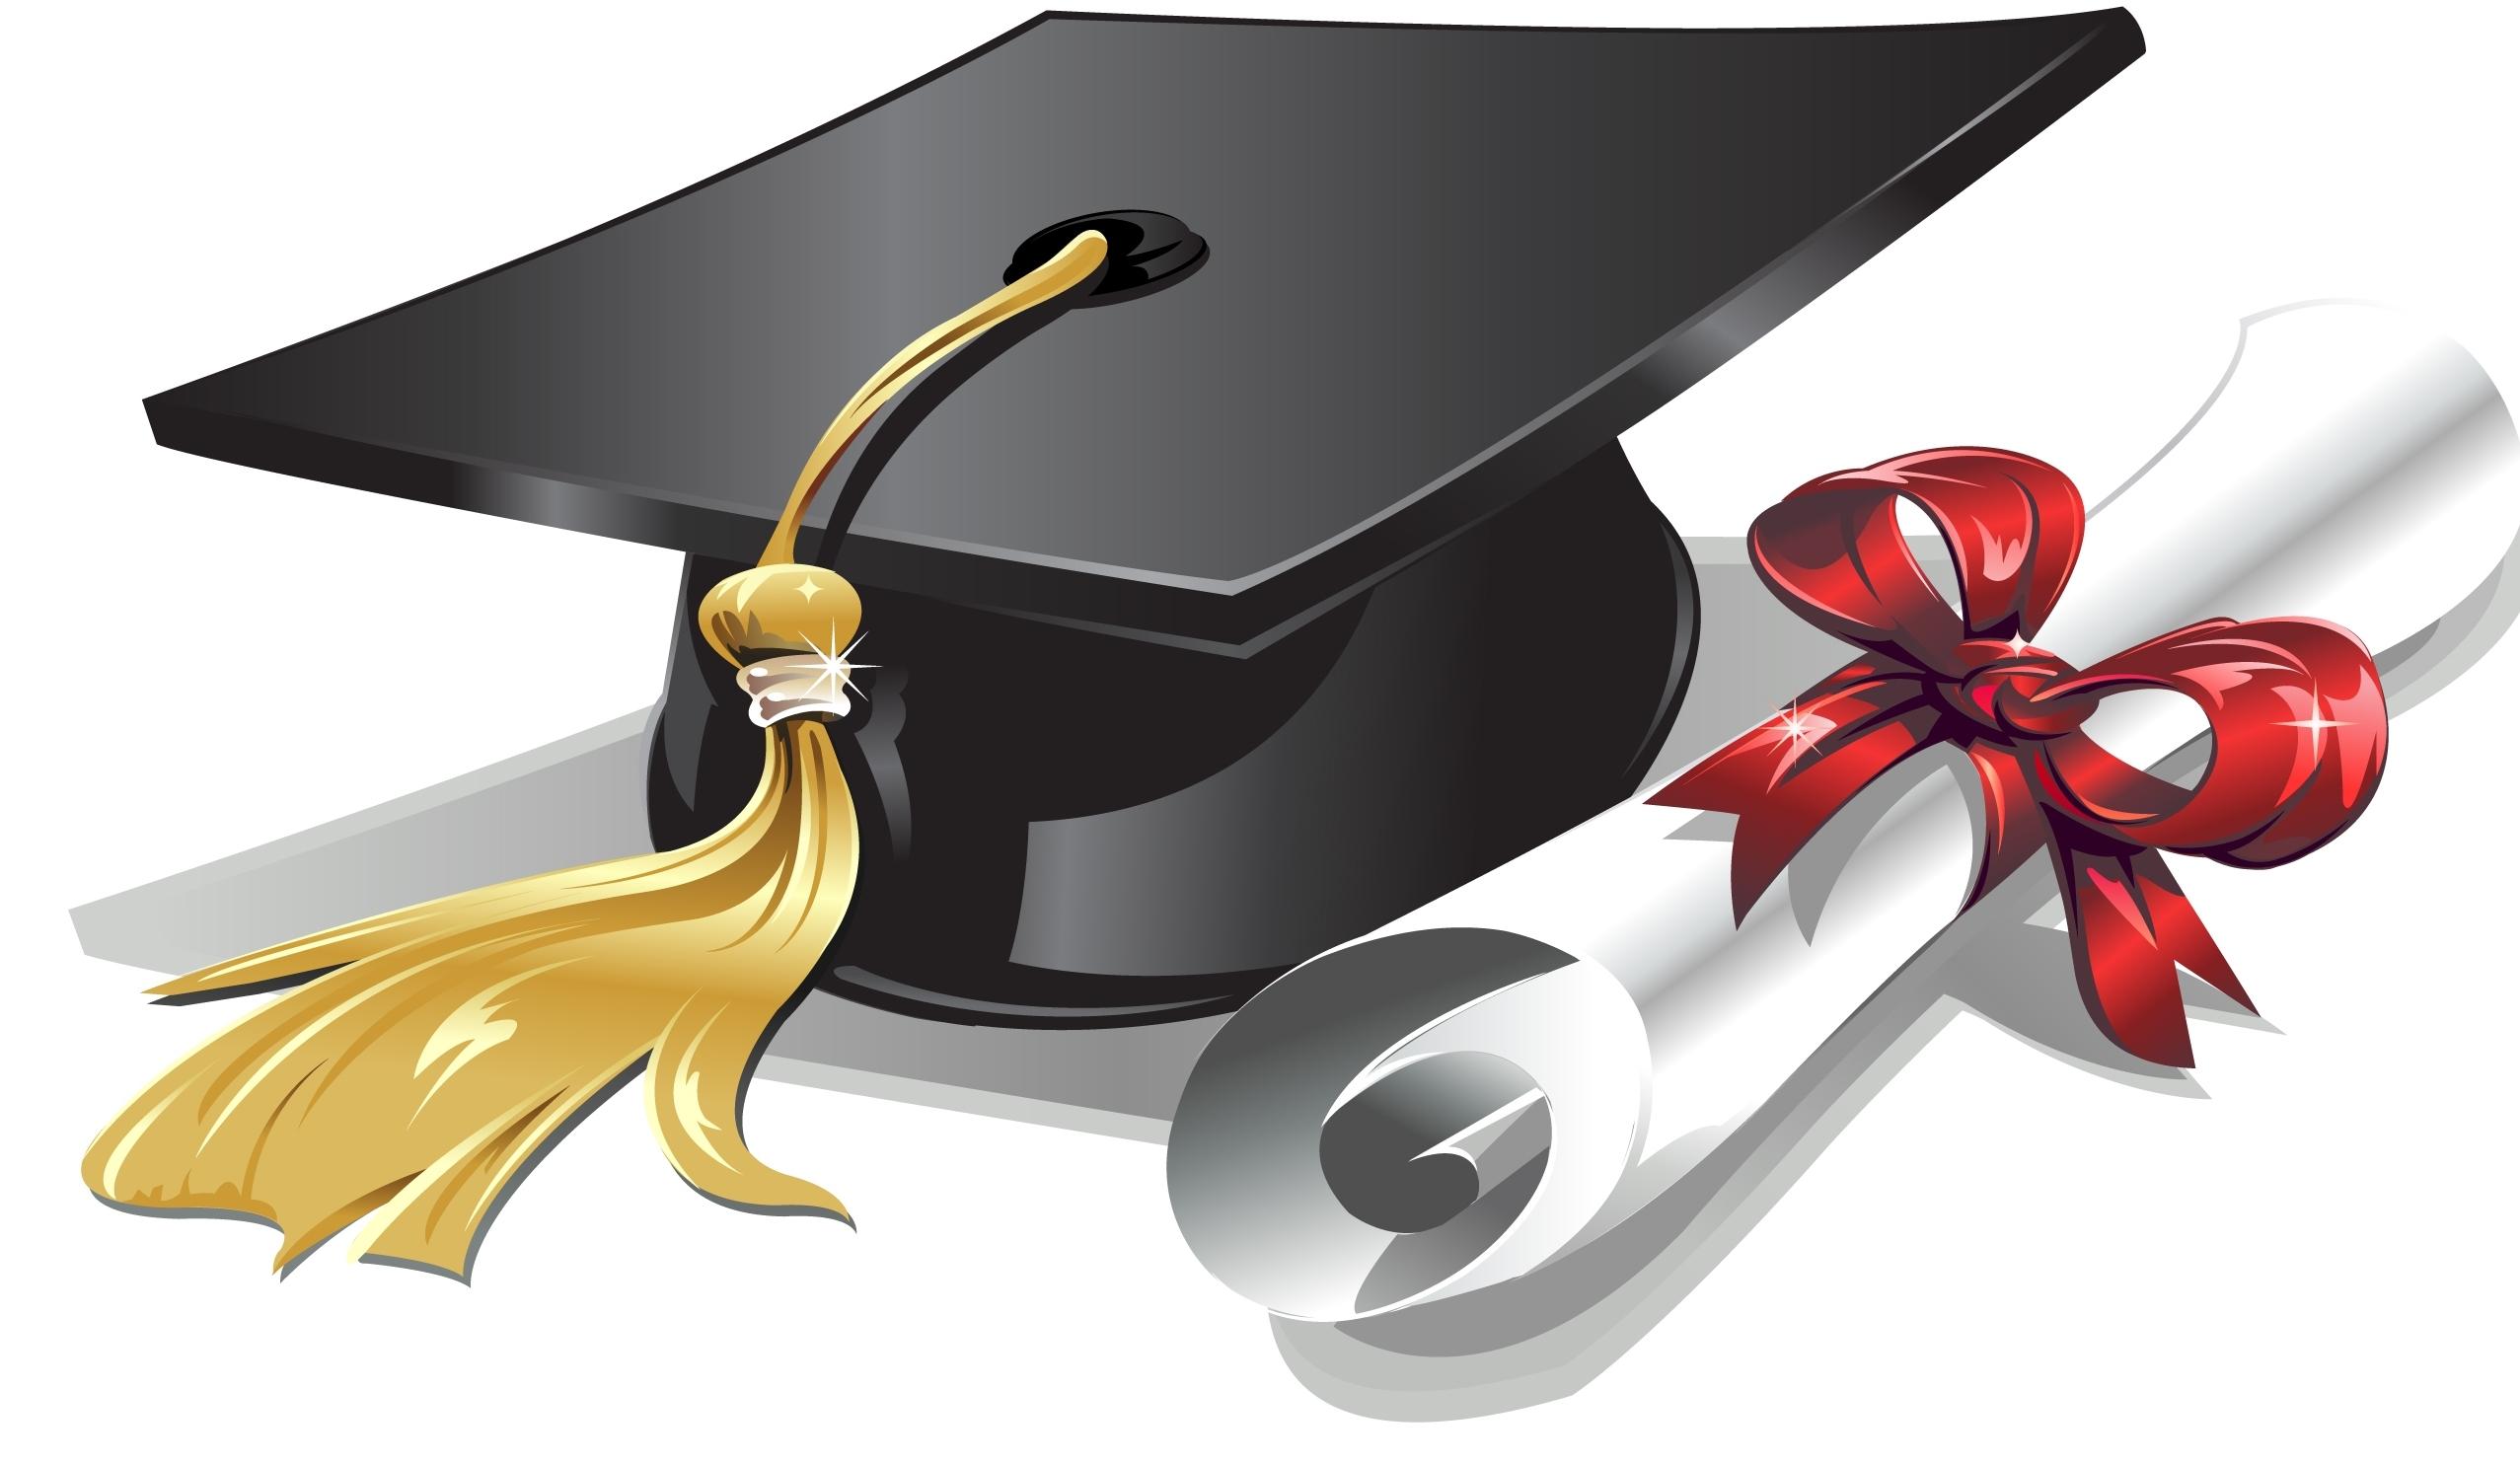 Ashcraft and Gerel Scholarship image